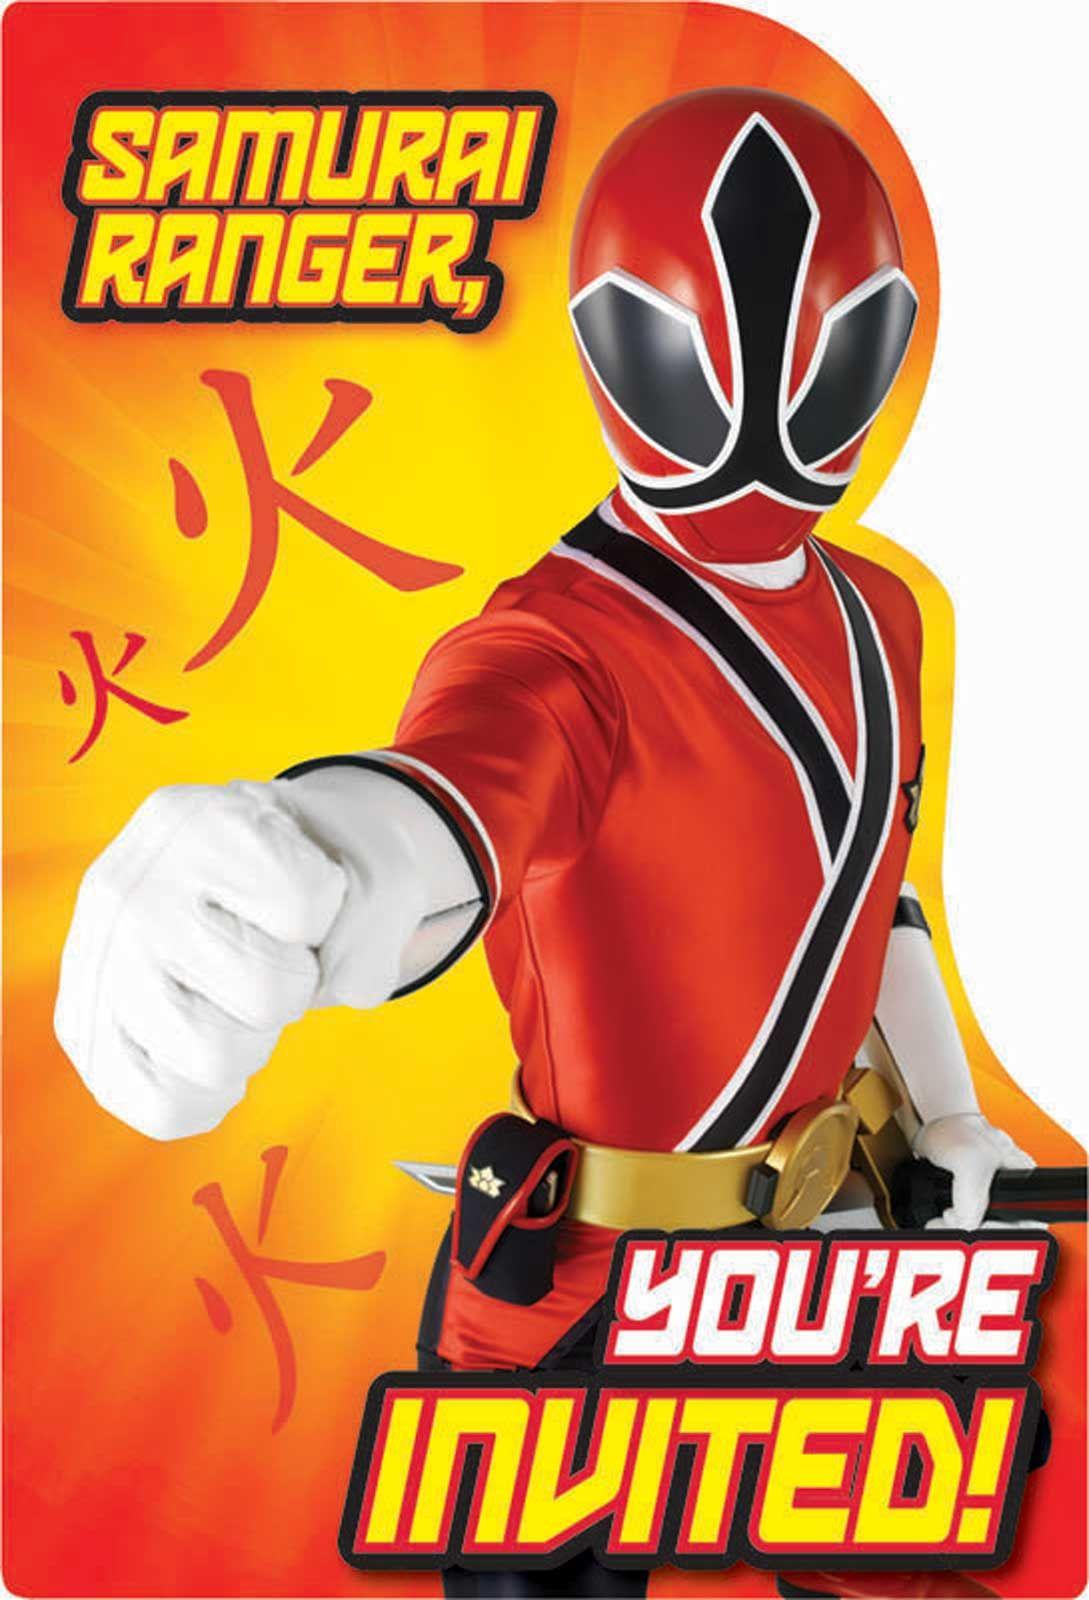 Free Power Ranger Birthday Invitations | Bagvania Invitation - Free Printable Power Ranger Birthday Invitations